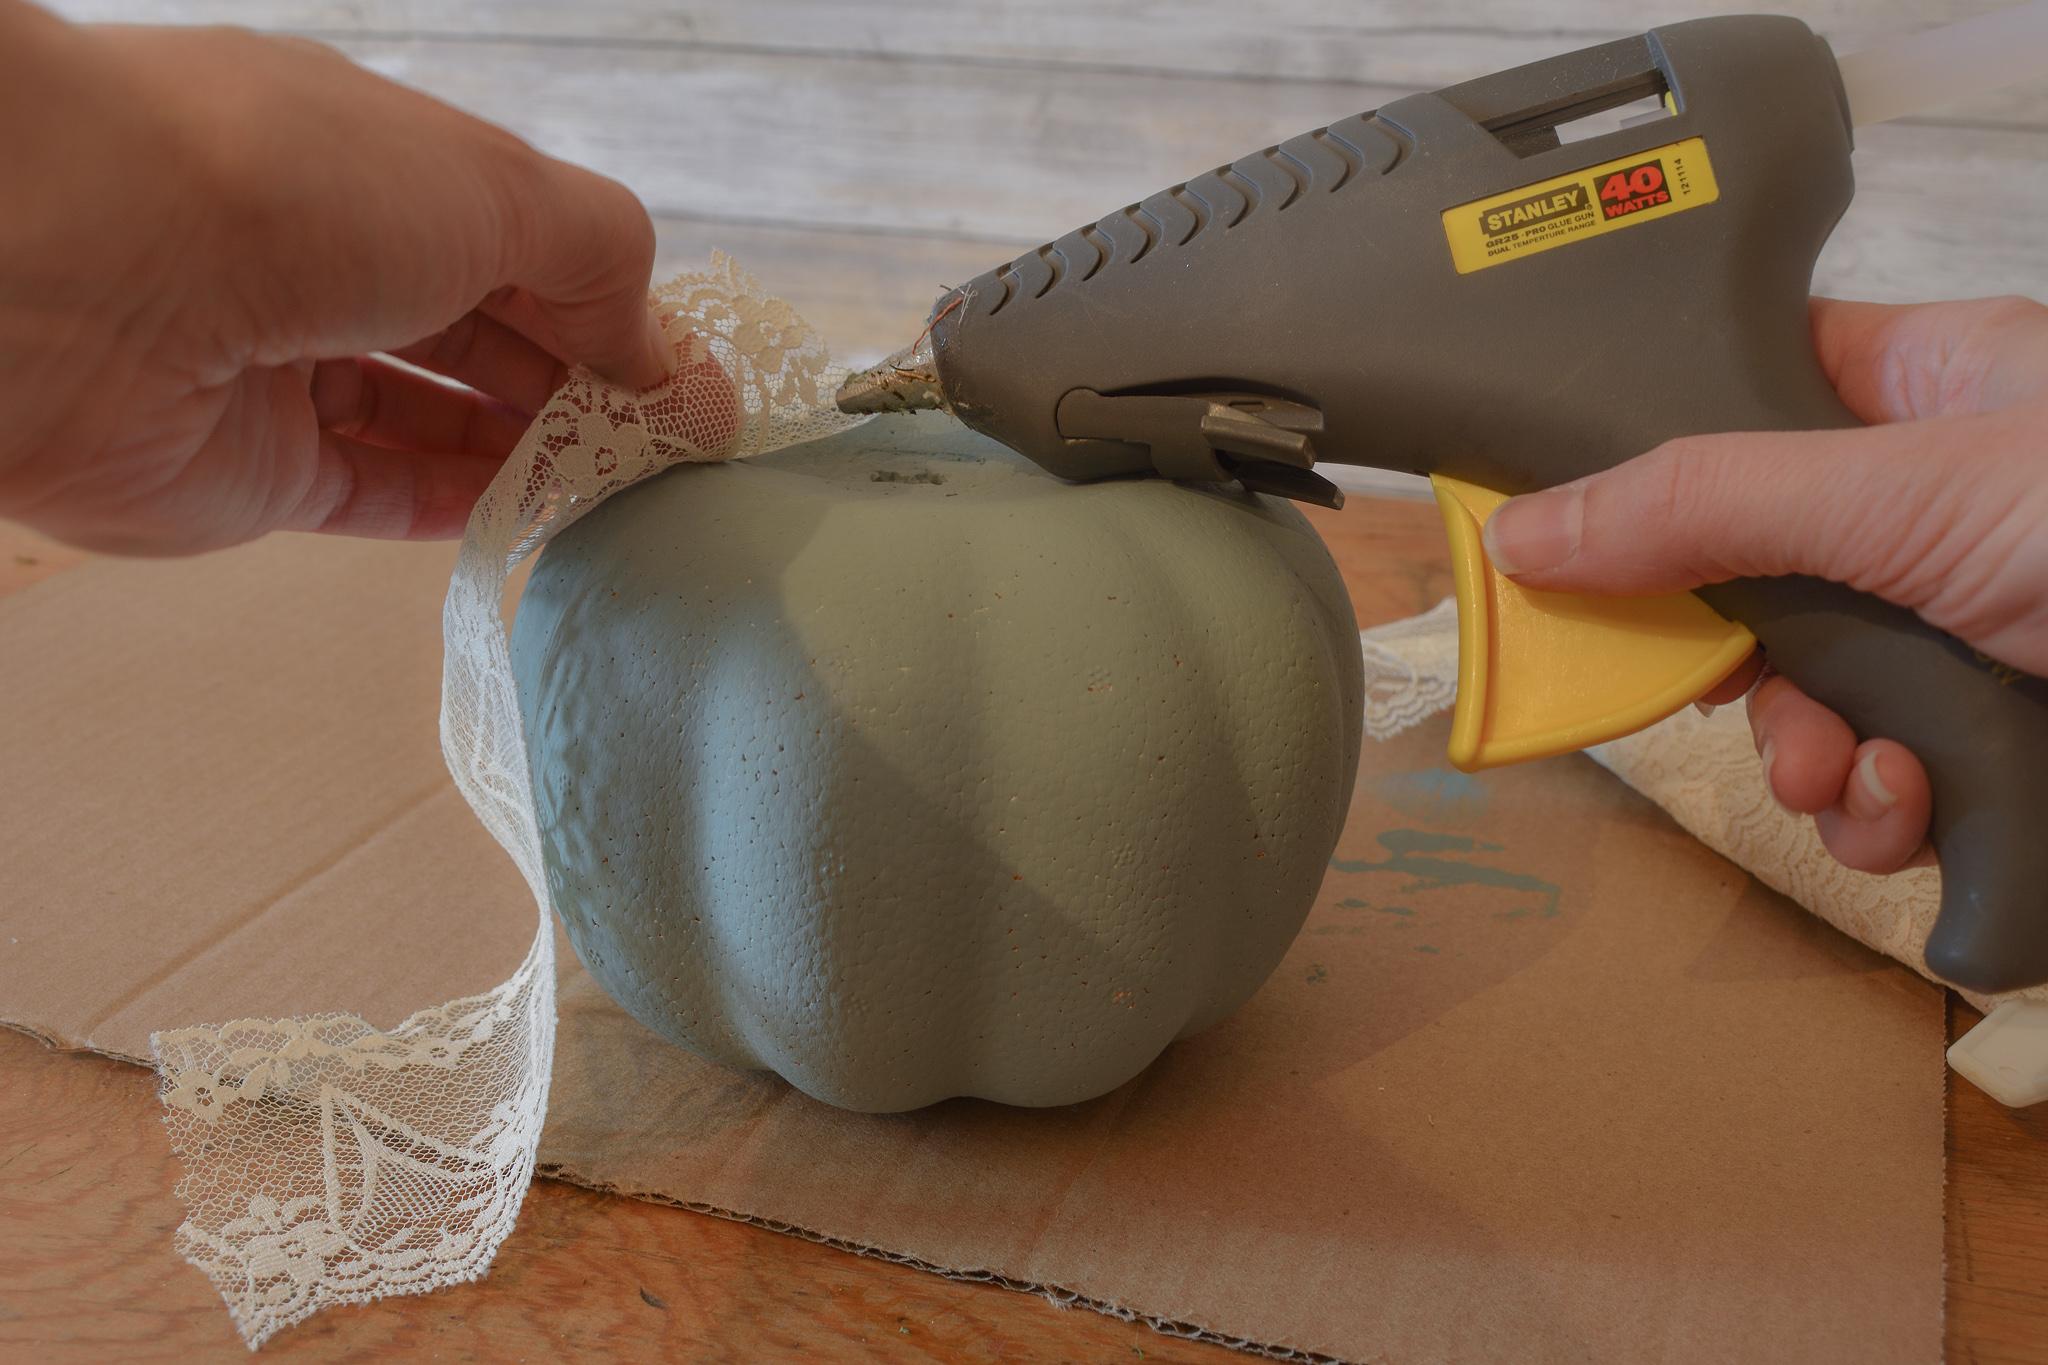 DIY Lace Pumpkins | zucchinisisters.com - Hot gluing lace onto DIY Lace Pumpkins. #zucchinisisters #dollartreedecor #lacepumpkins #falldecor